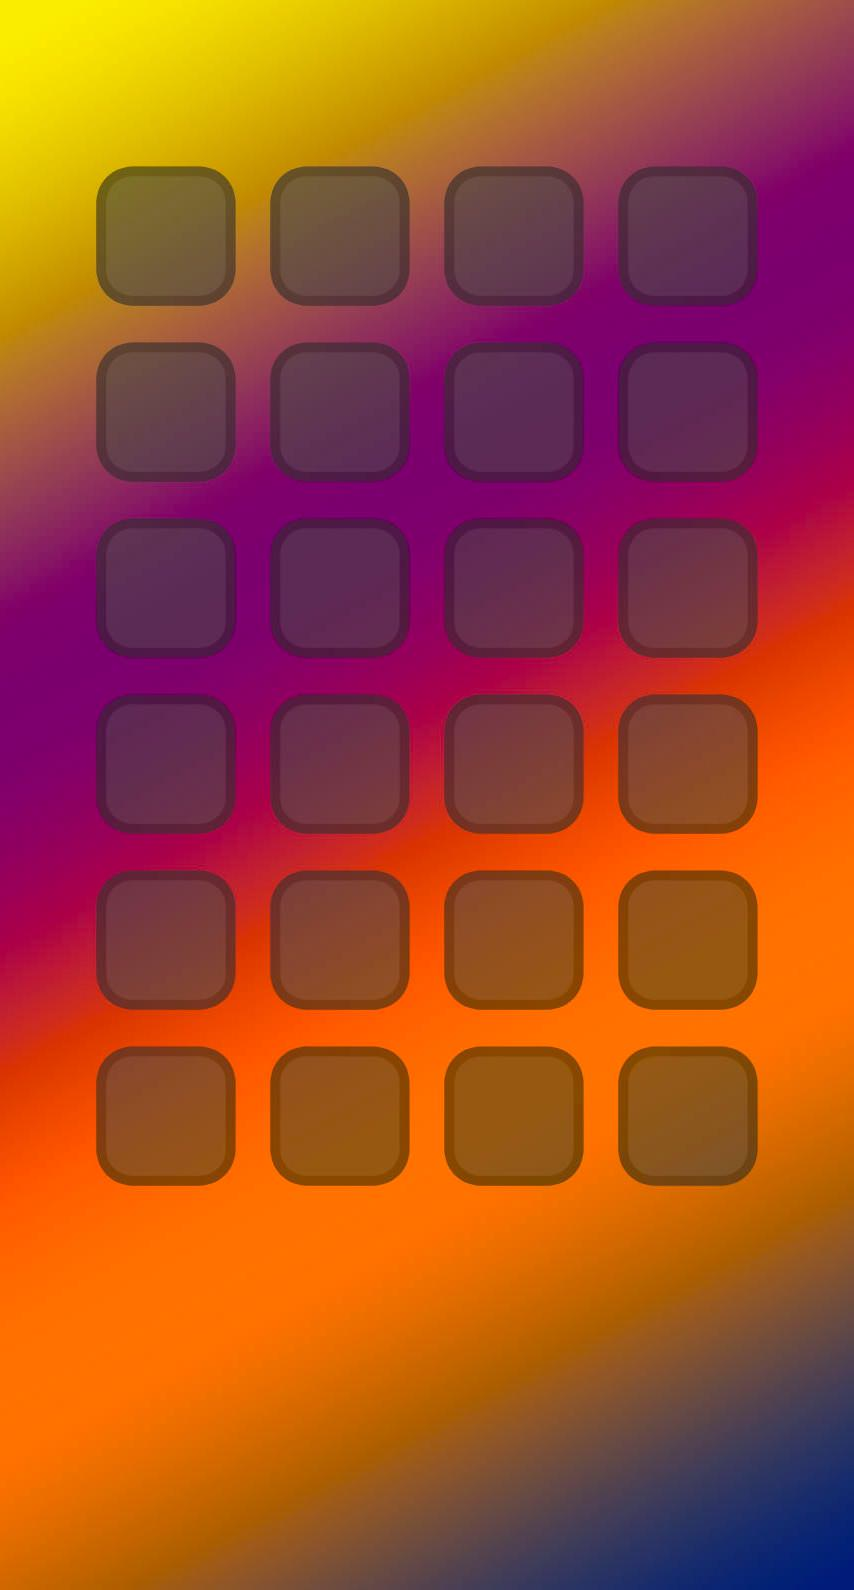 Rak Warna Warni Keren Wallpapersc IPhone6s